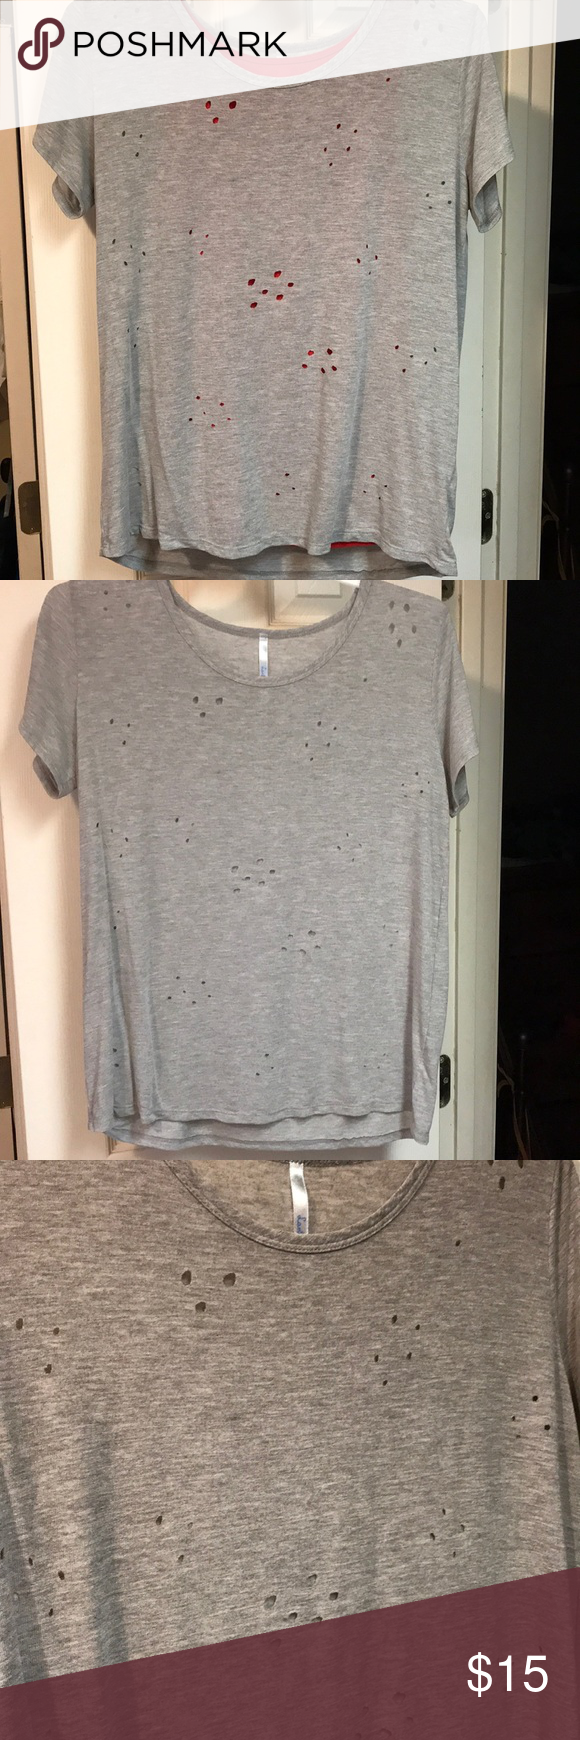 Gray Burn Hole Shirt Clothes Design Fashion Design Fashion Tips